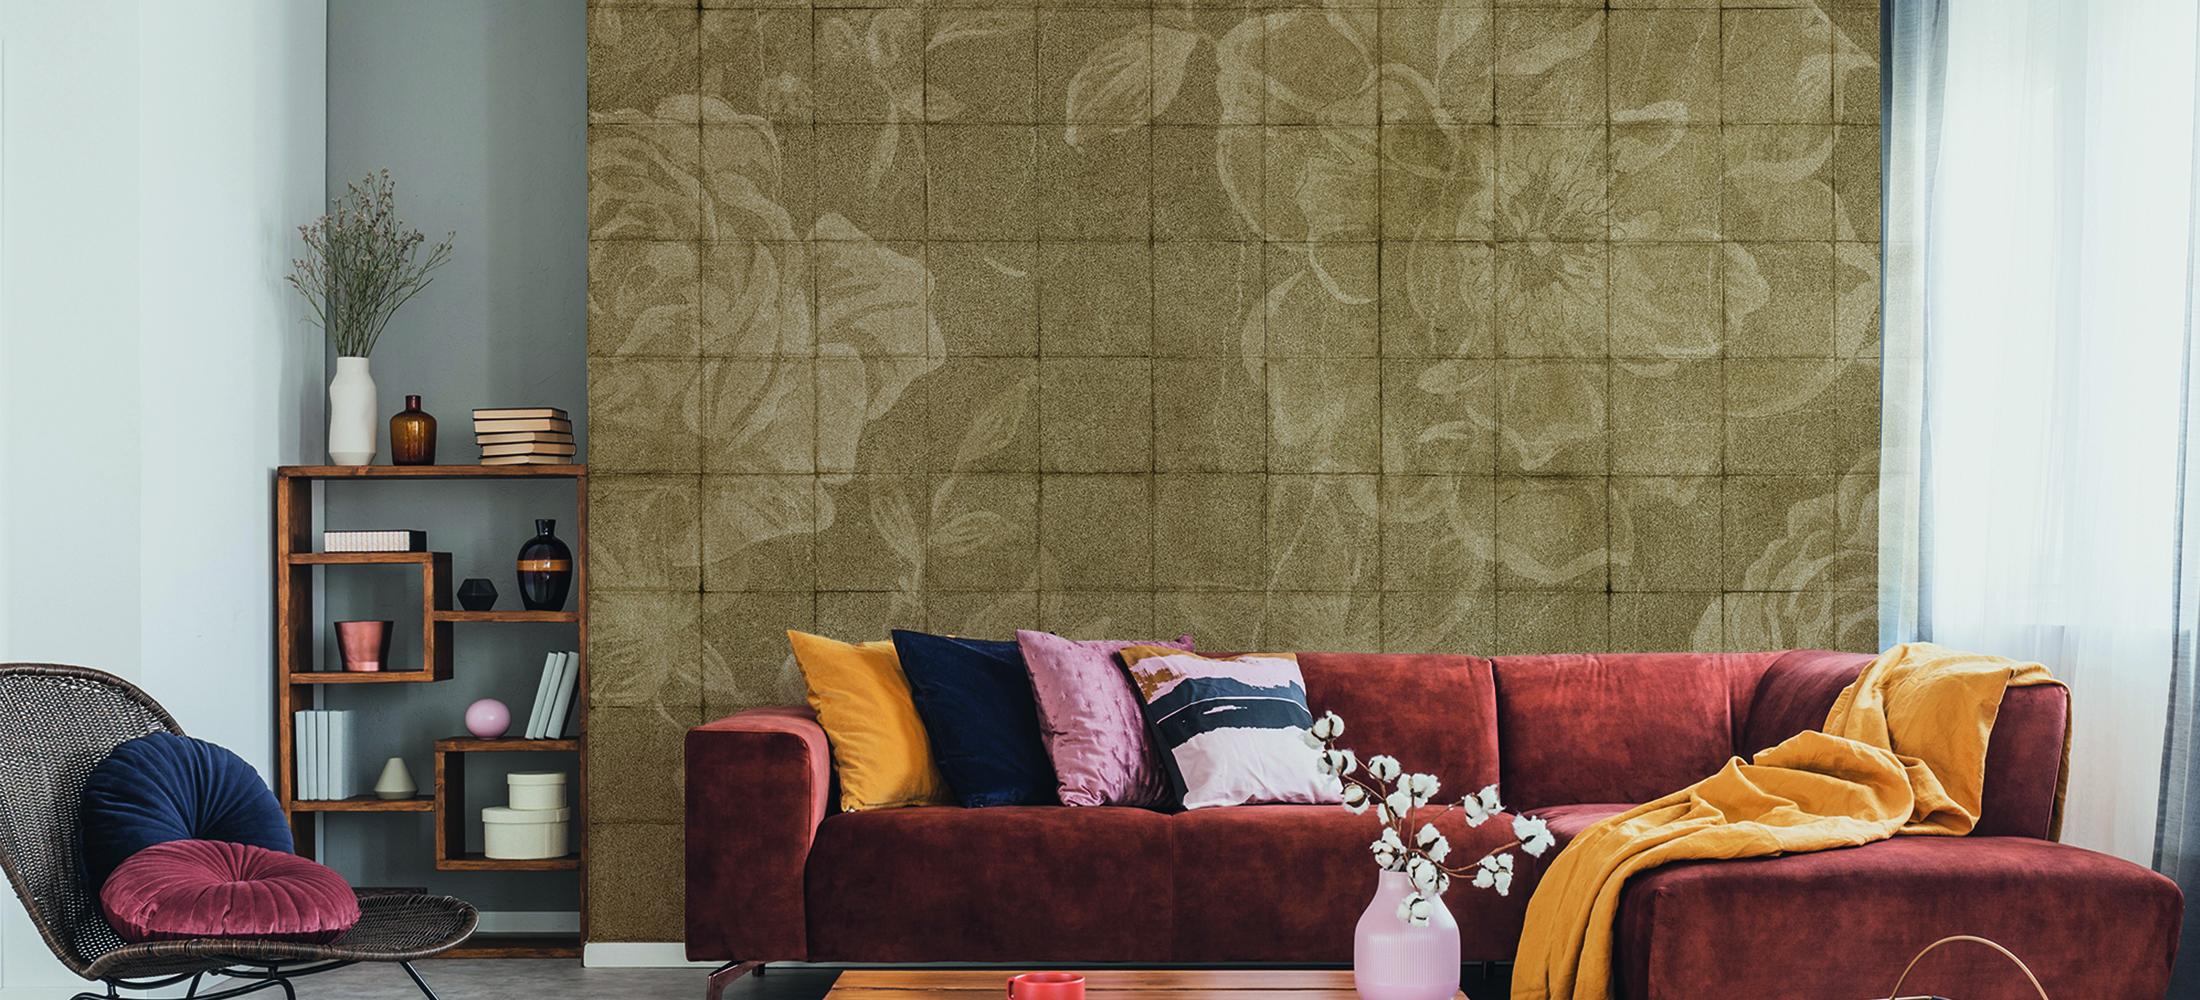 floral tiles slideshow